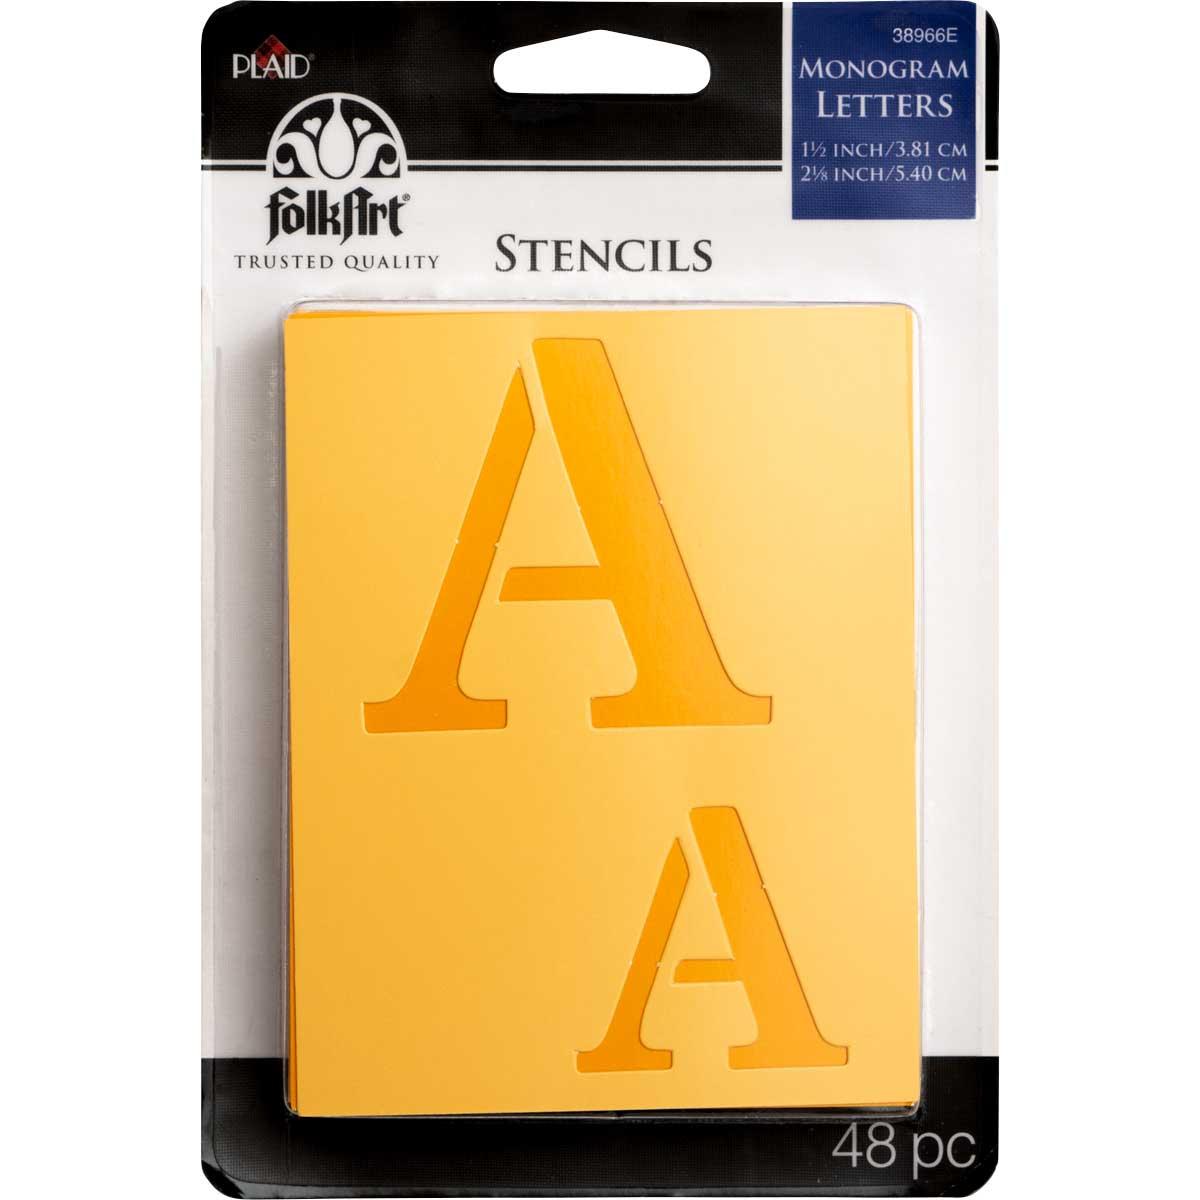 FolkArt ® Stencil Value Packs - Letter Stencils - Monogram